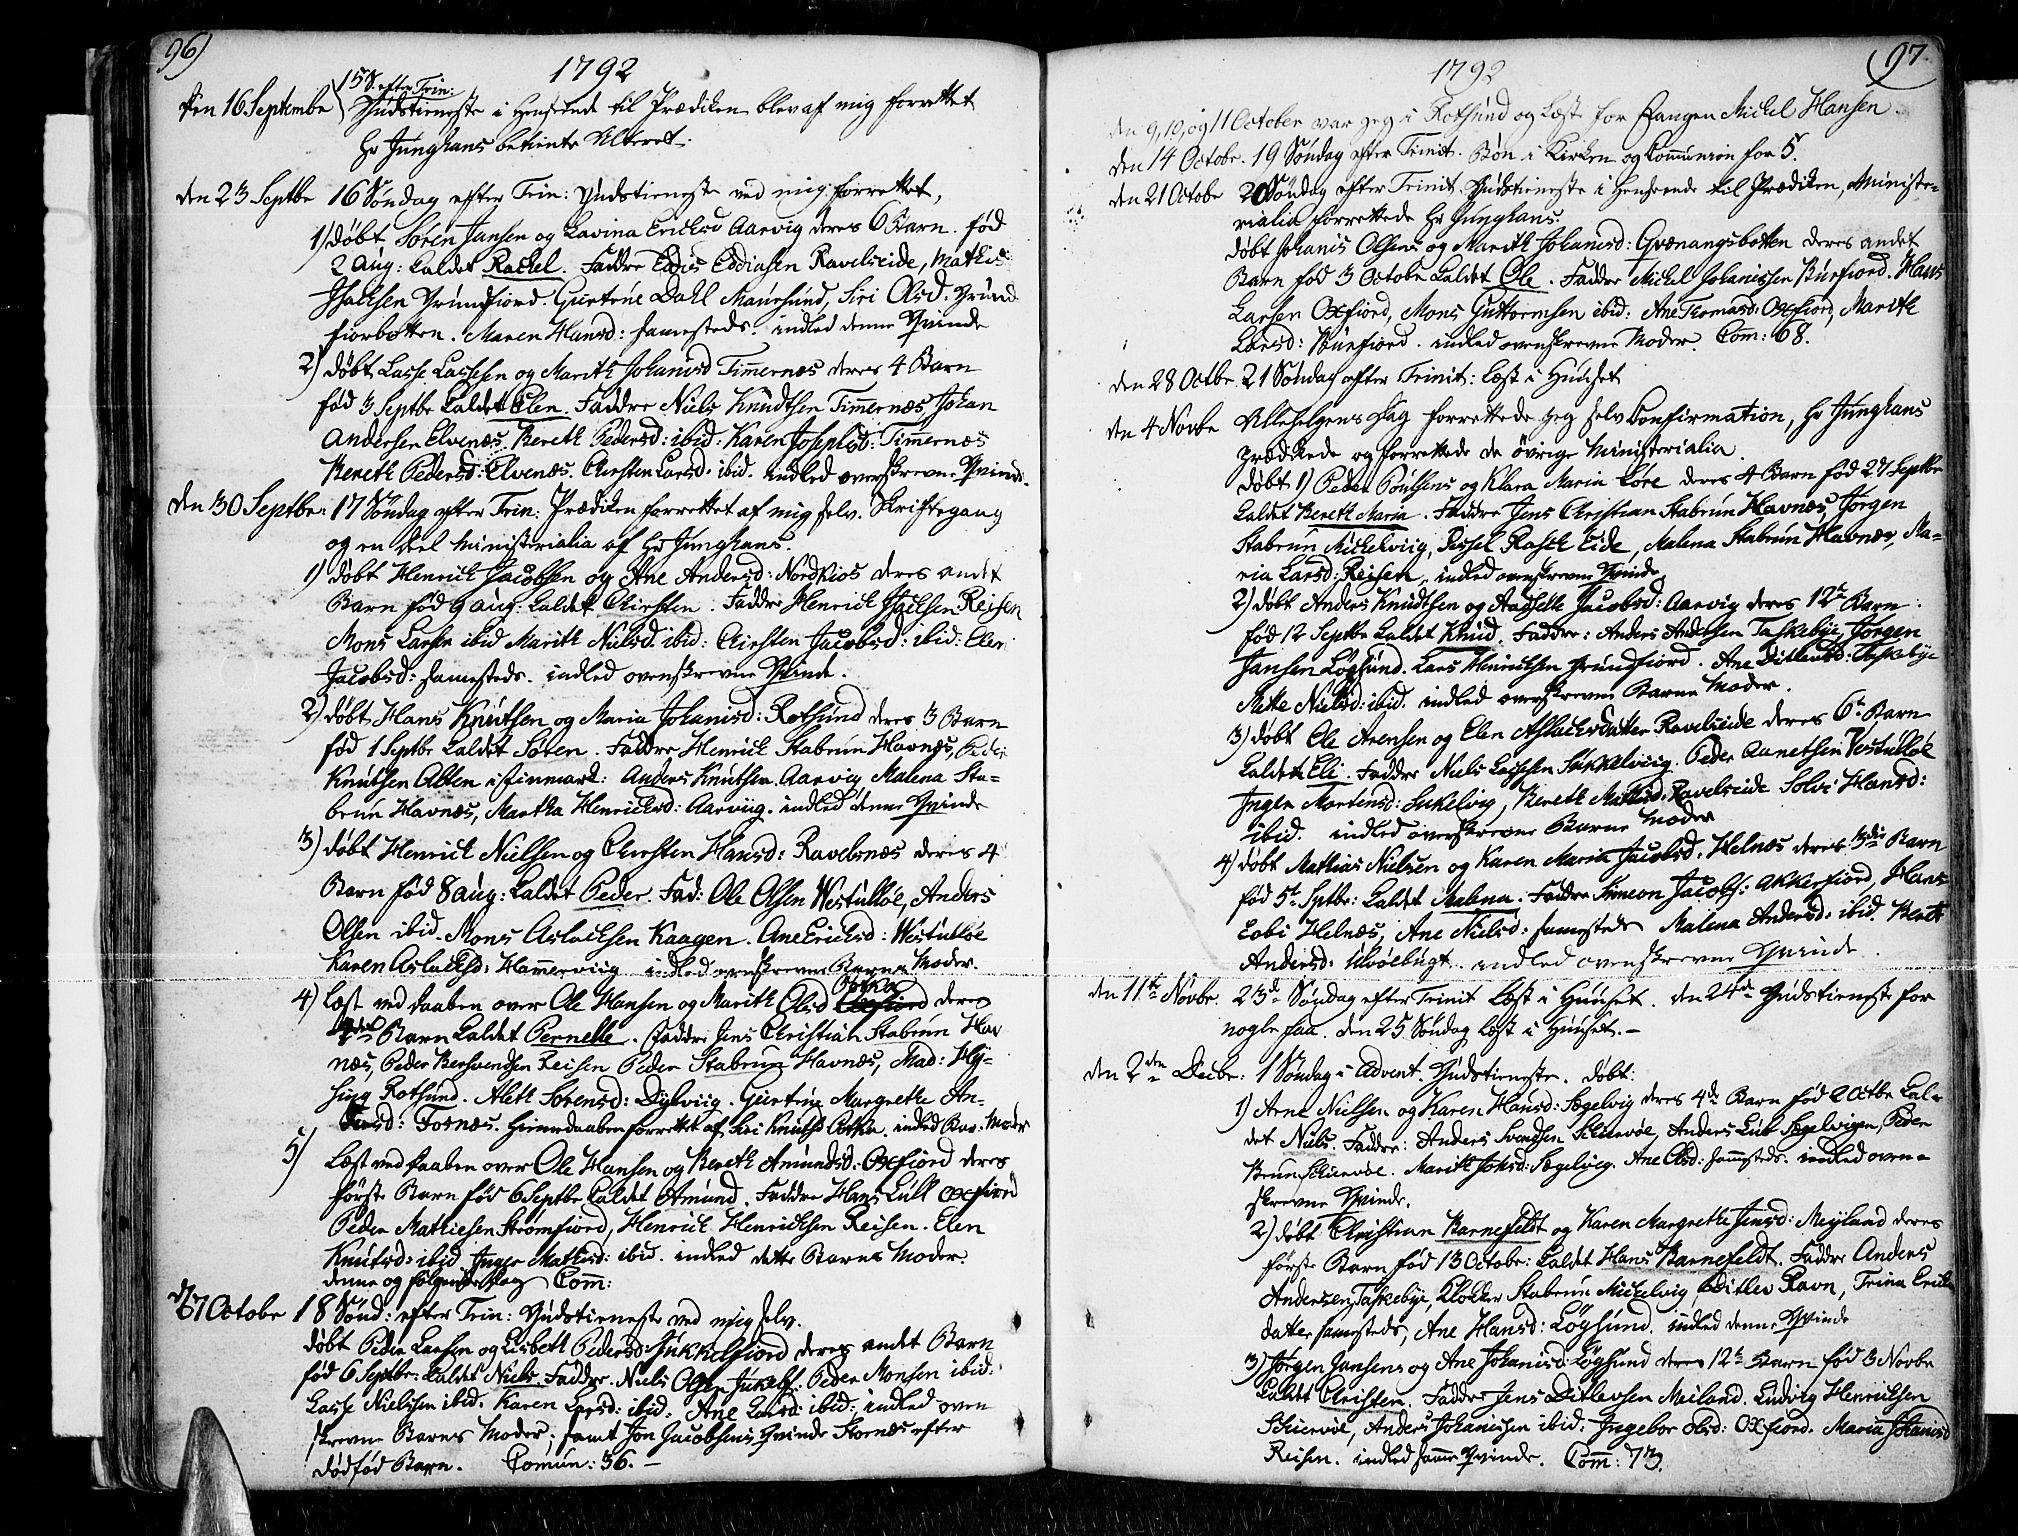 SATØ, Skjervøy sokneprestkontor, H/Ha/Haa/L0002kirke: Ministerialbok nr. 2, 1781-1817, s. 96-97